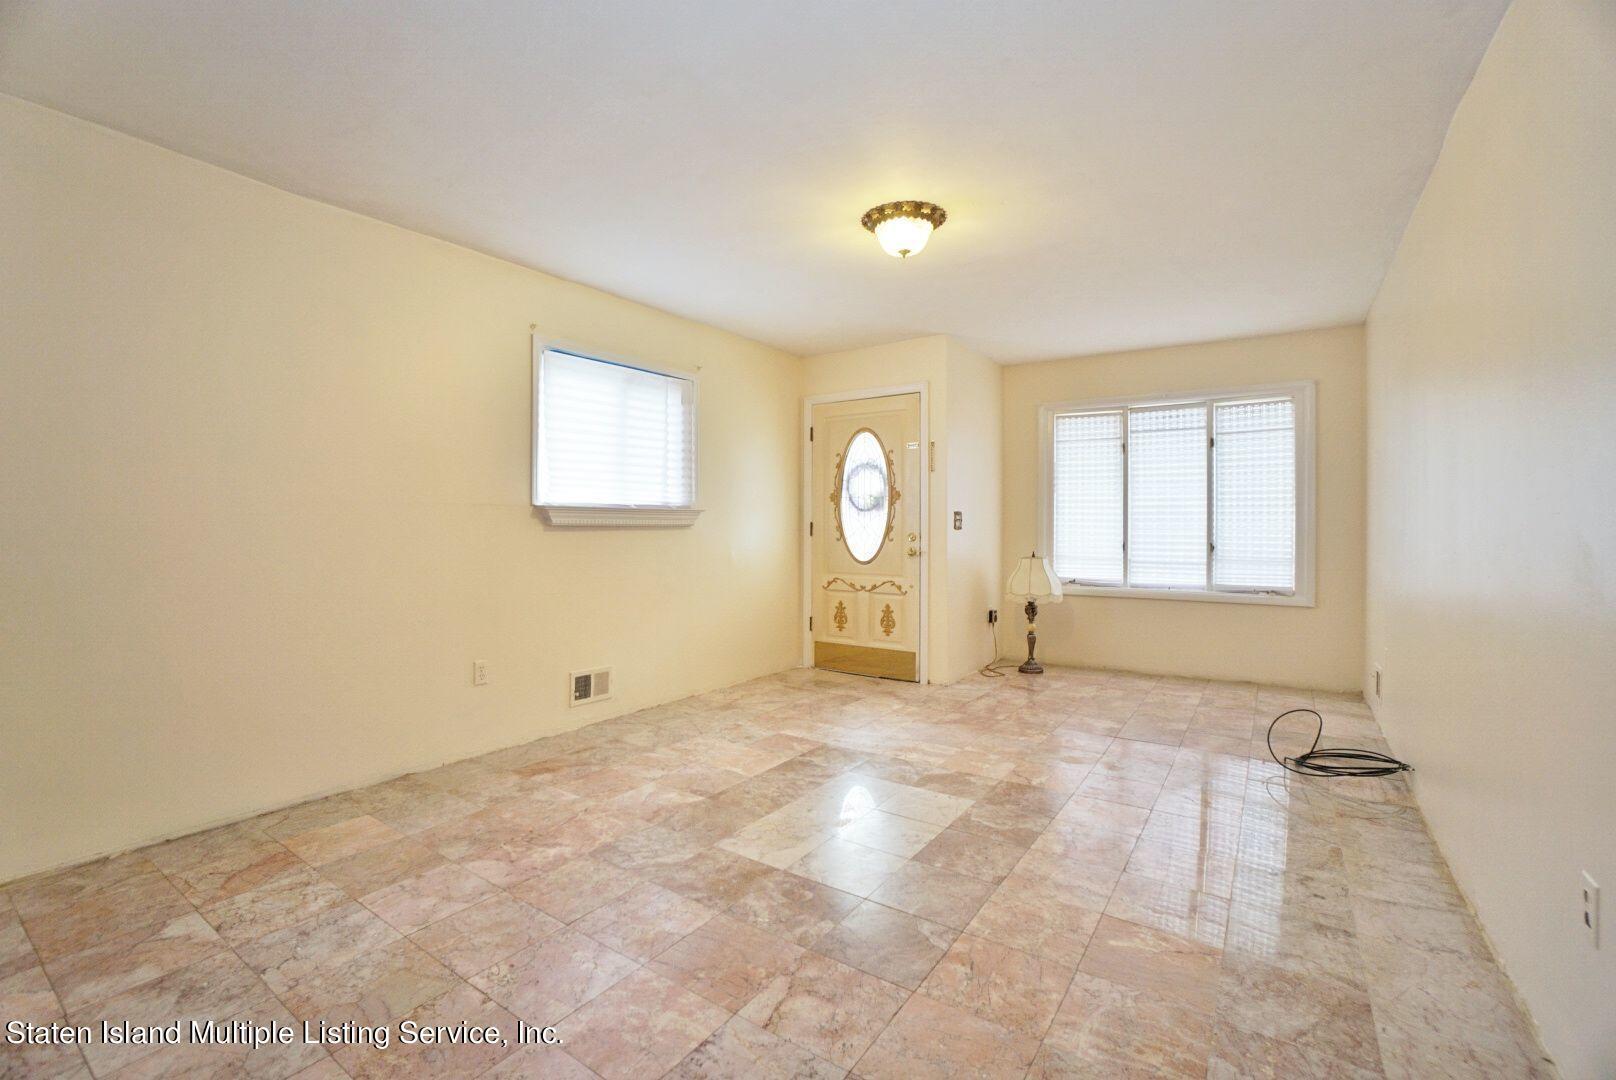 Single Family - Detached 94 Cranford Avenue  Staten Island, NY 10306, MLS-1146620-8